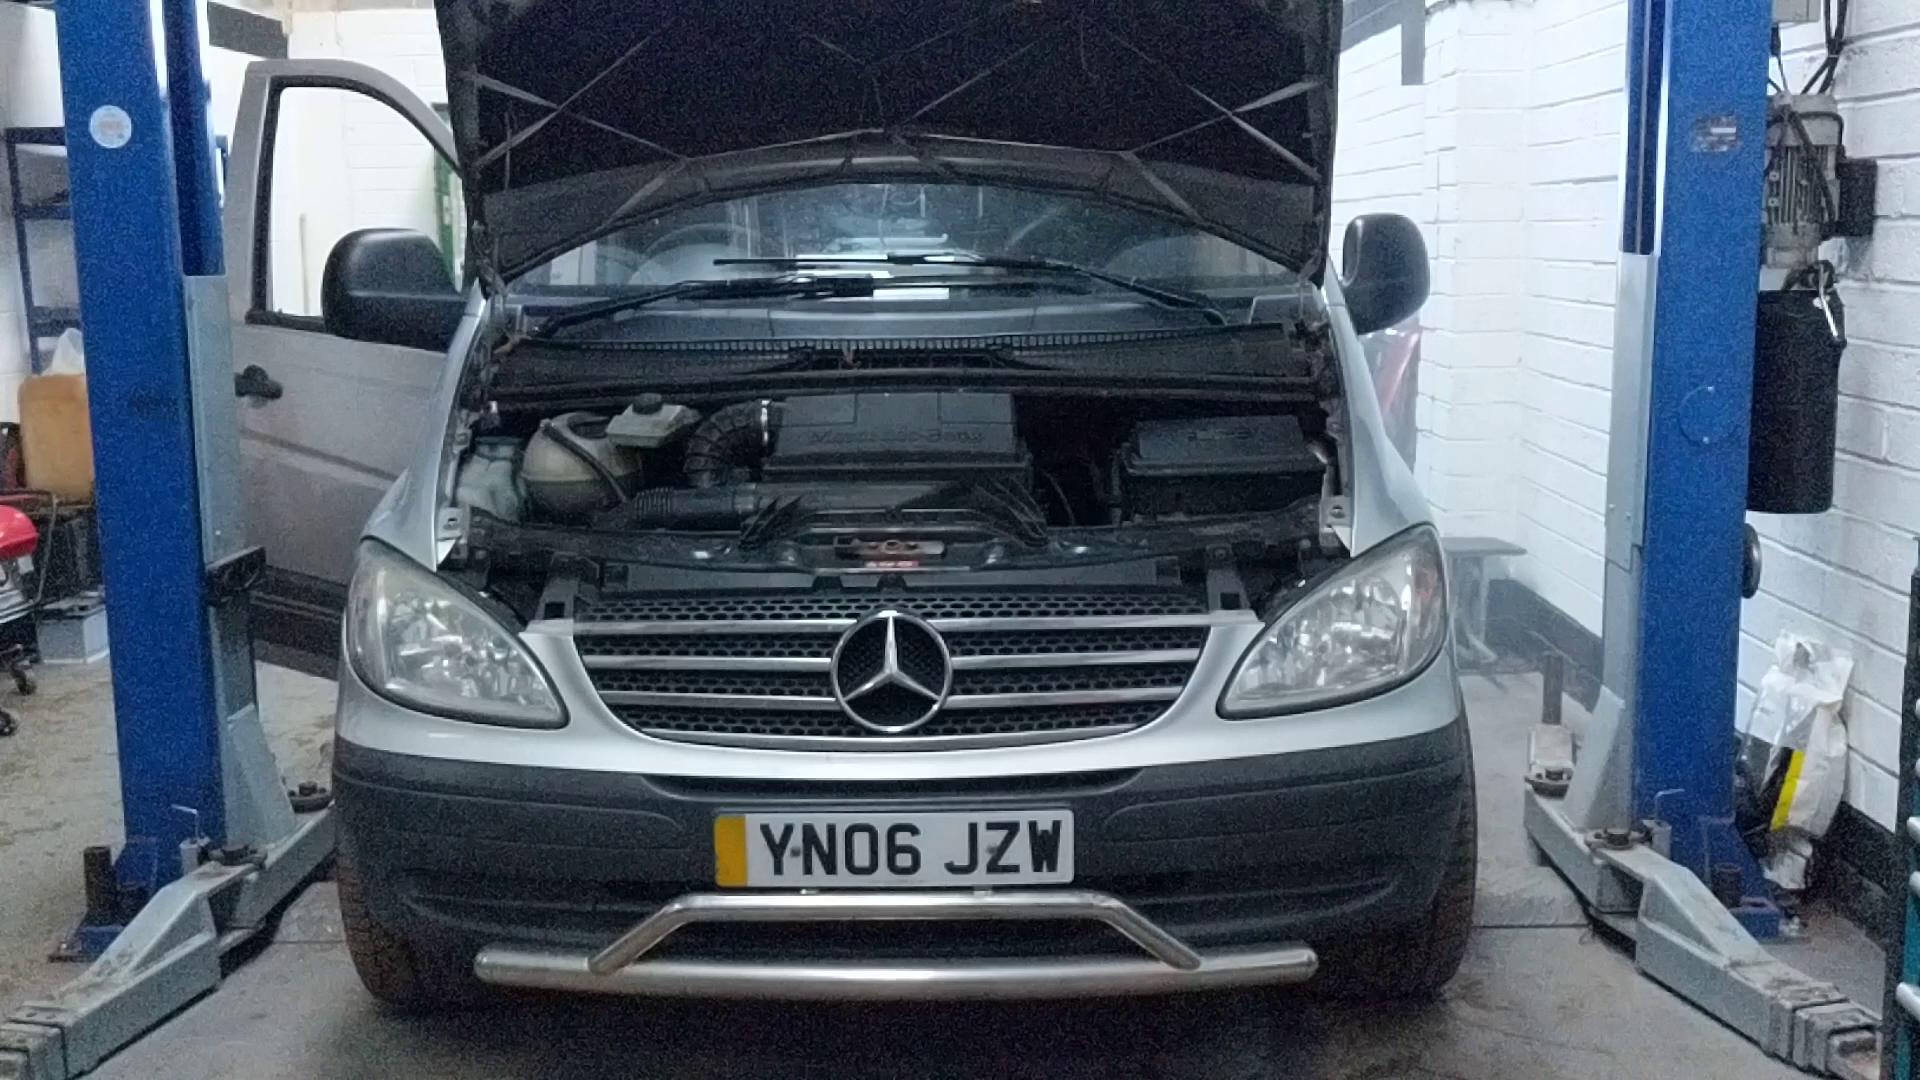 Vito engine test